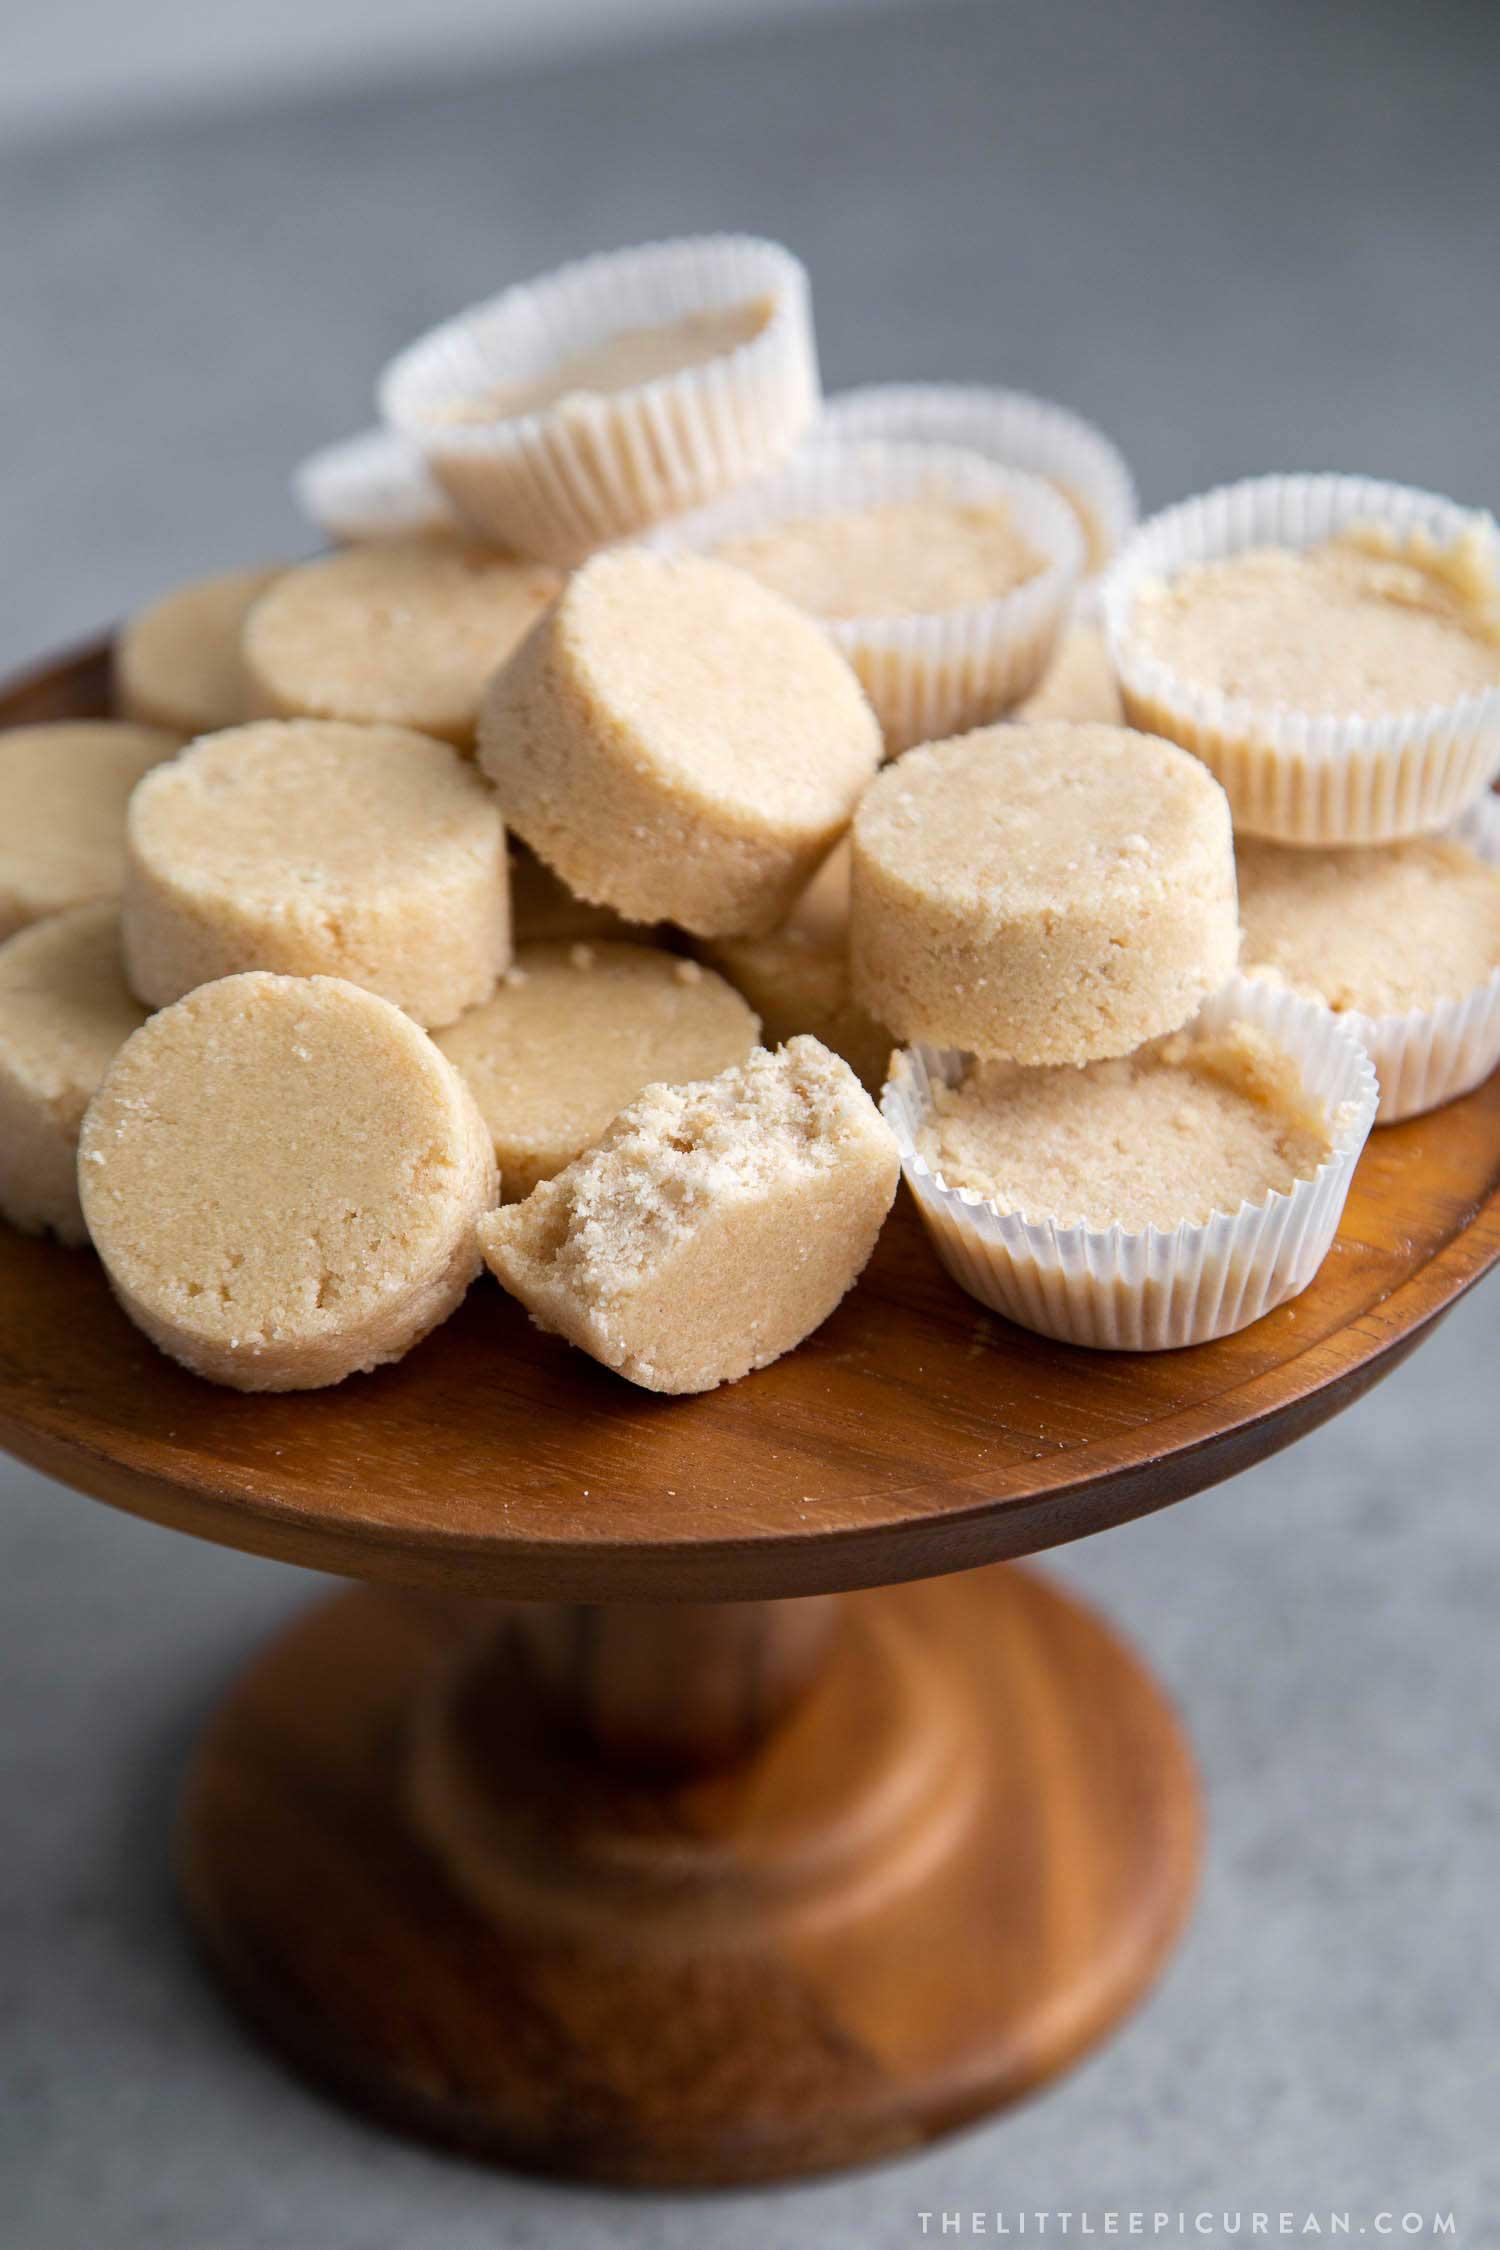 Filipino Polvoron Shortbread Cookies